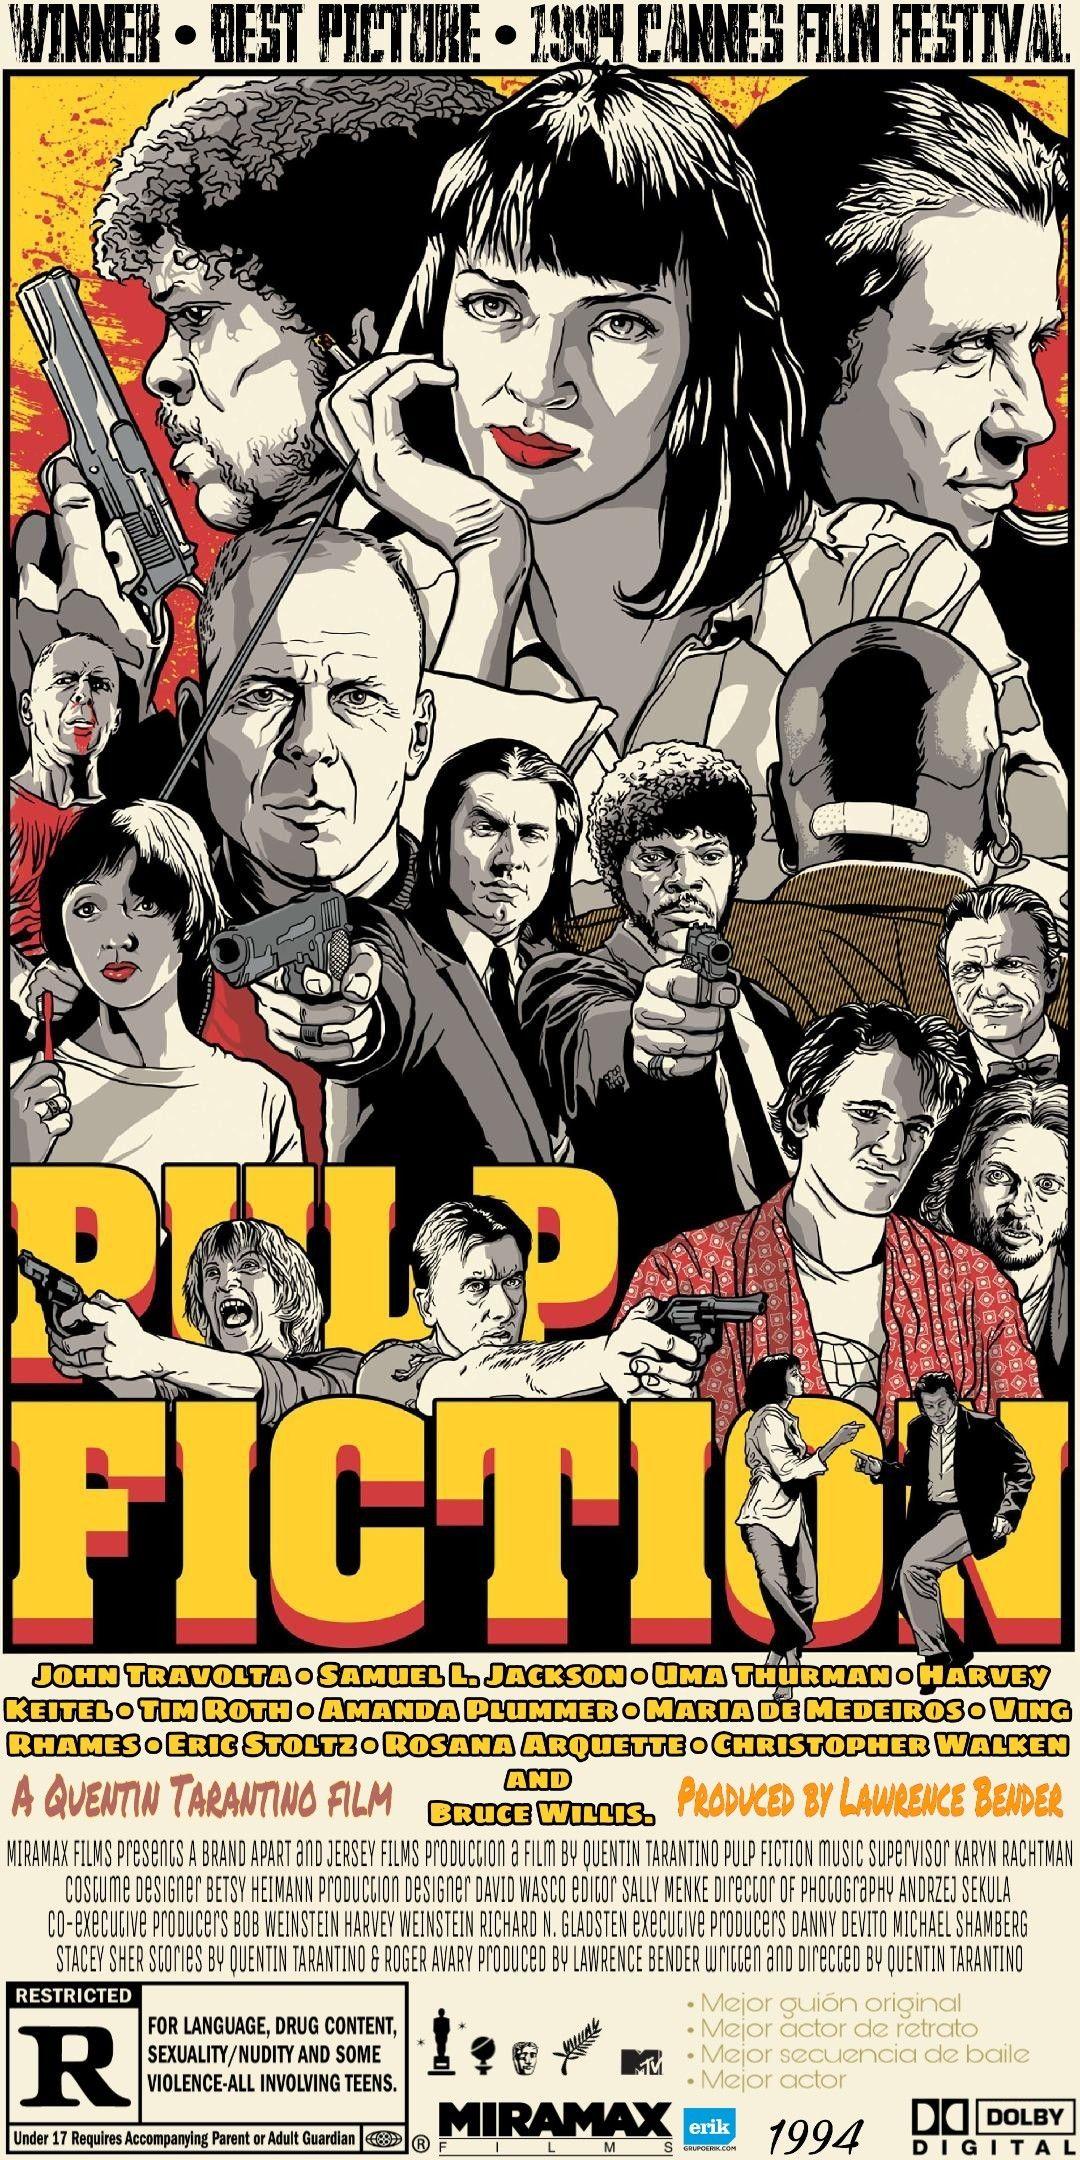 Wallpaper Pulp Fiction Quentin Tarantino Fondo De Pantalla Pulp Fiction Classic Movie Posters Film Posters Vintage